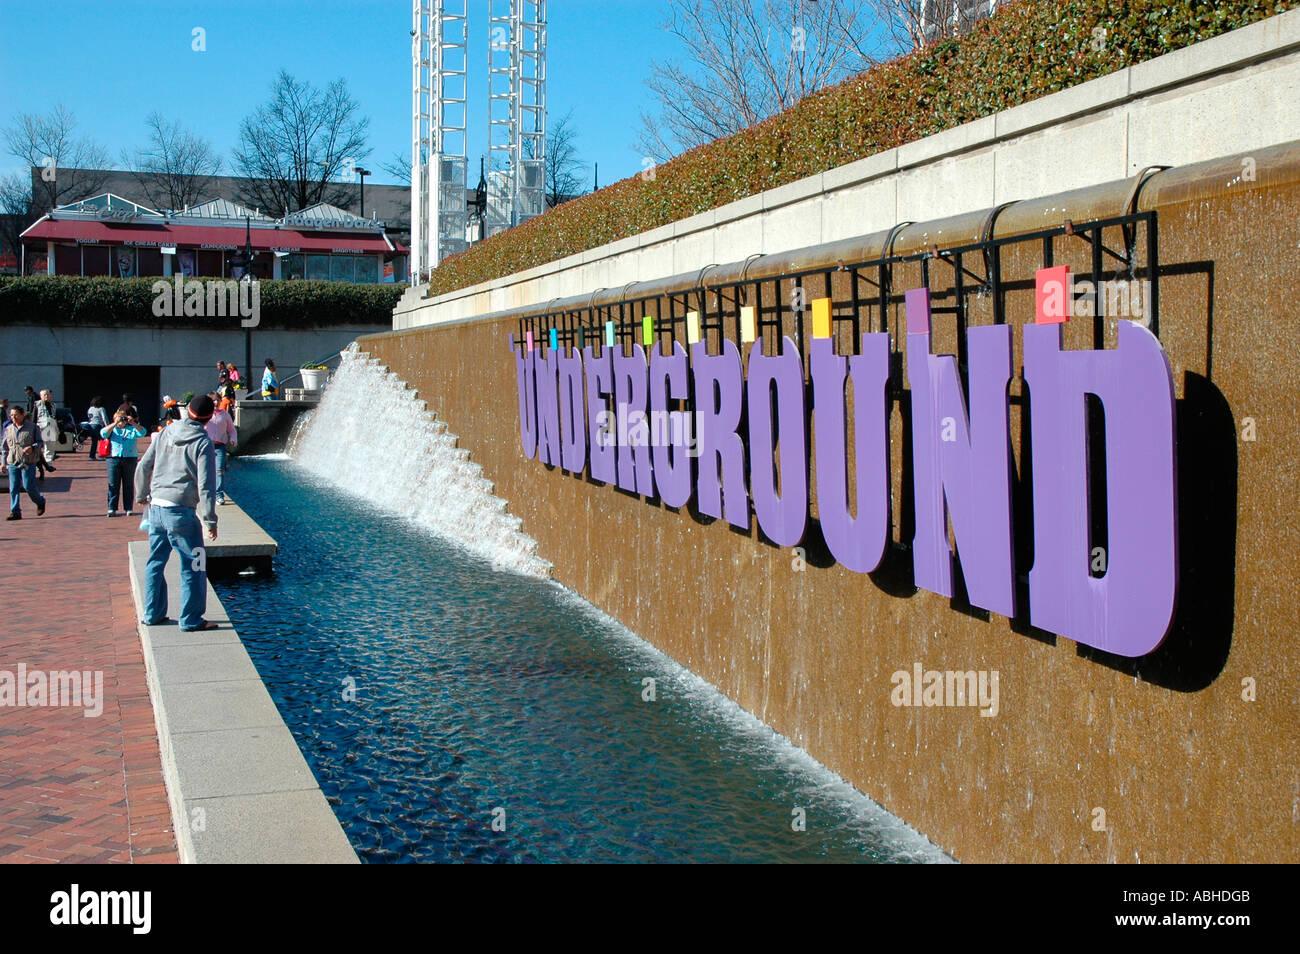 Georgian Souvenirs Stock Photos Georgian Souvenirs Stock: Underground Atlanta Signs Downtown Atlanta GA Georgia USA